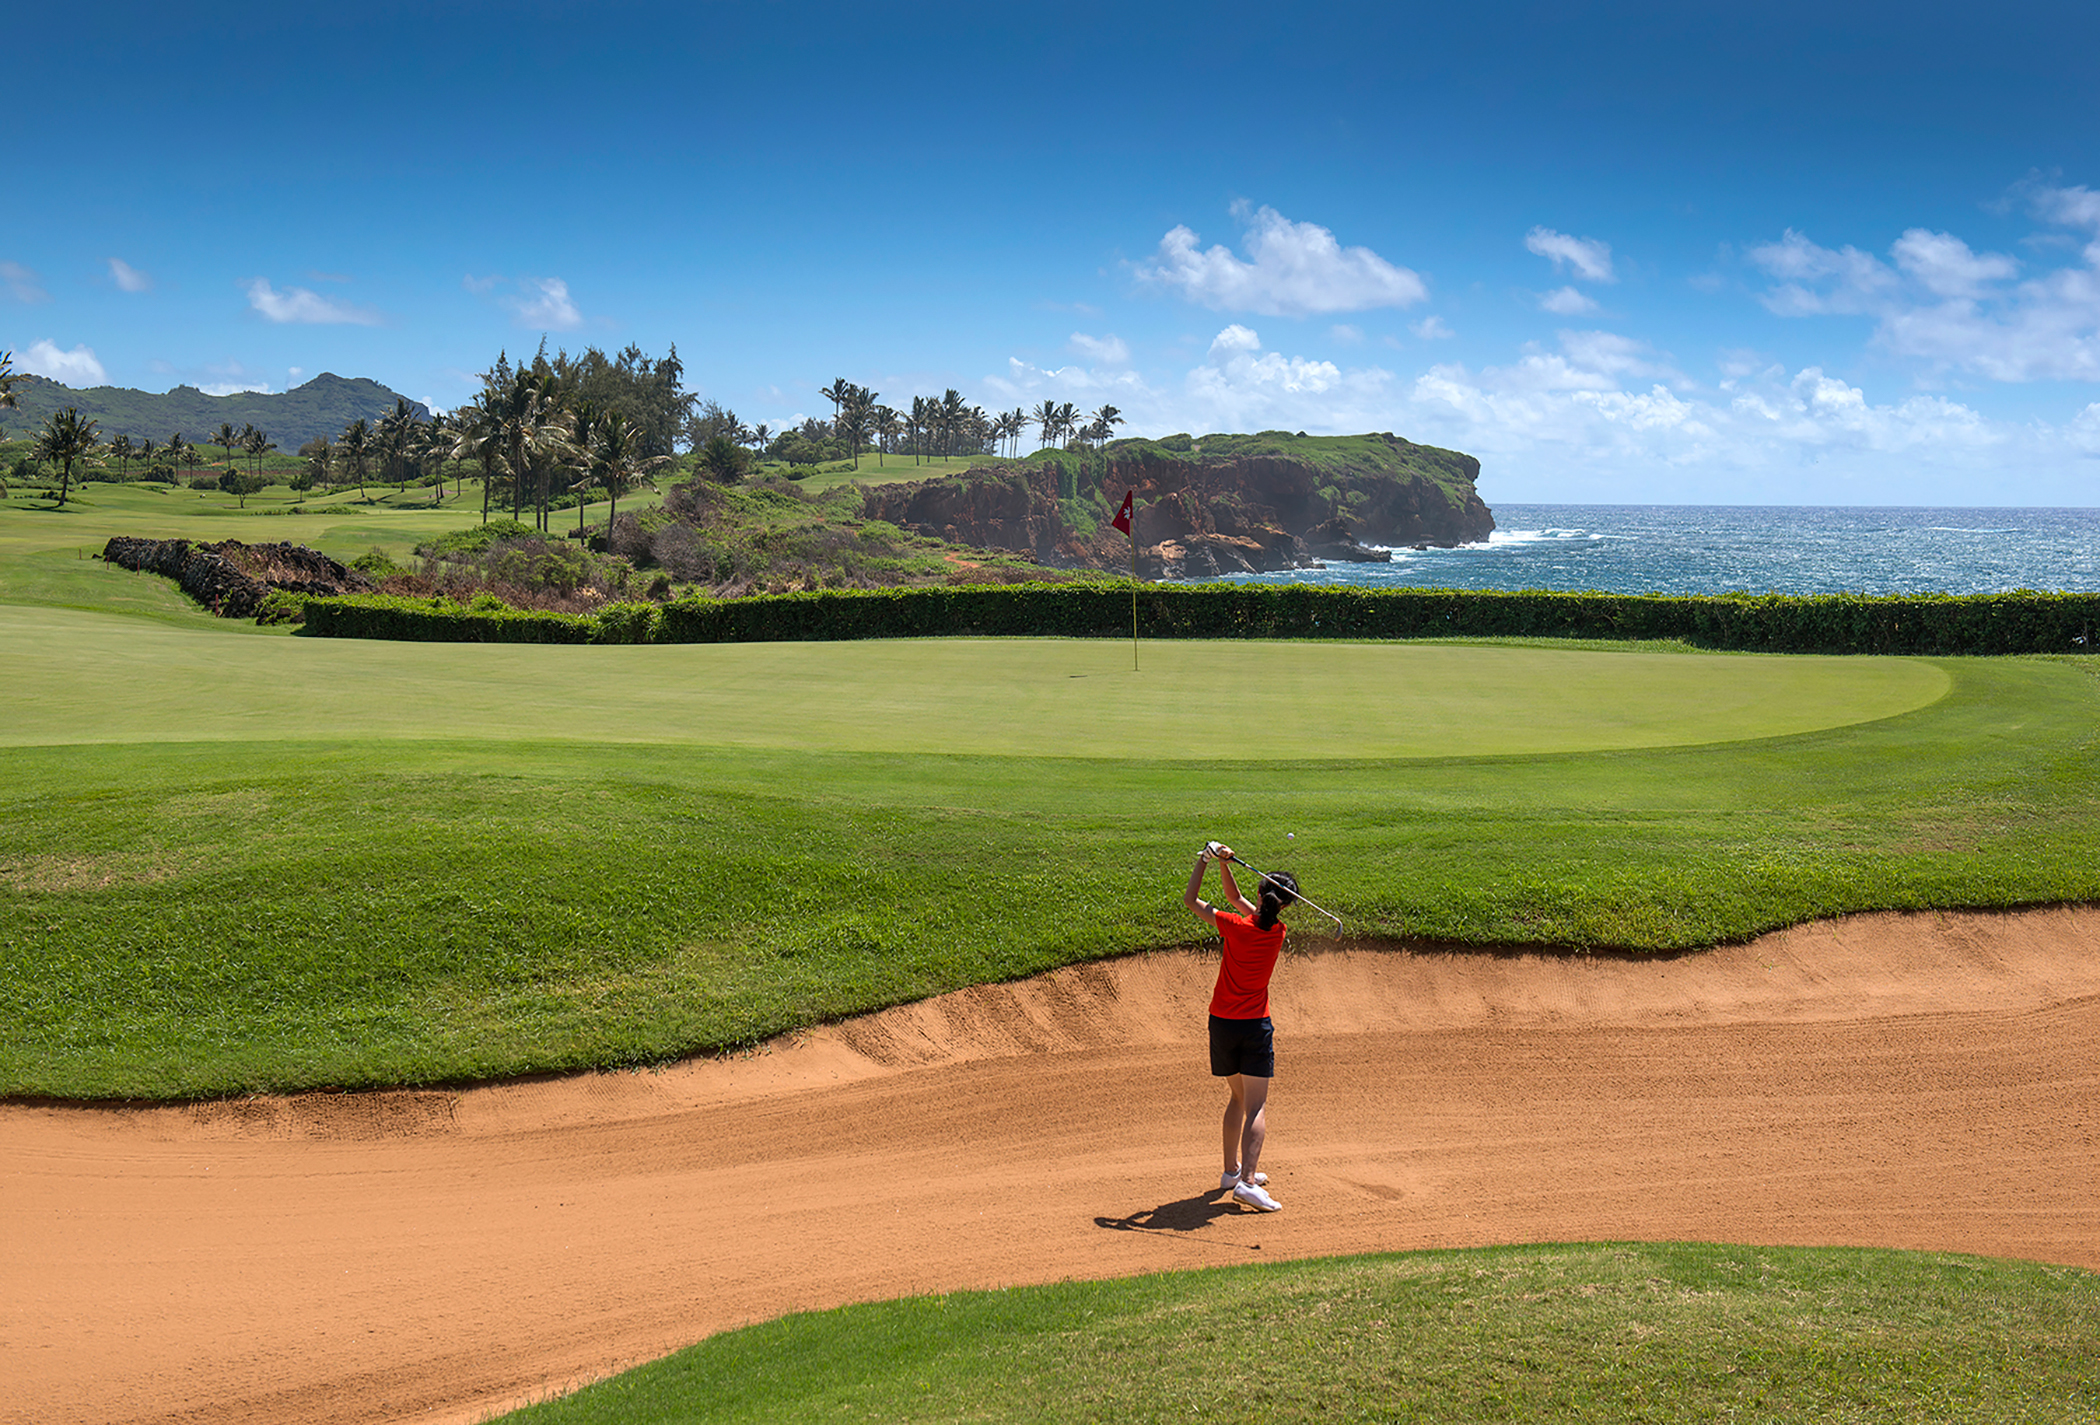 Kauai Poipu Bay Golf Course